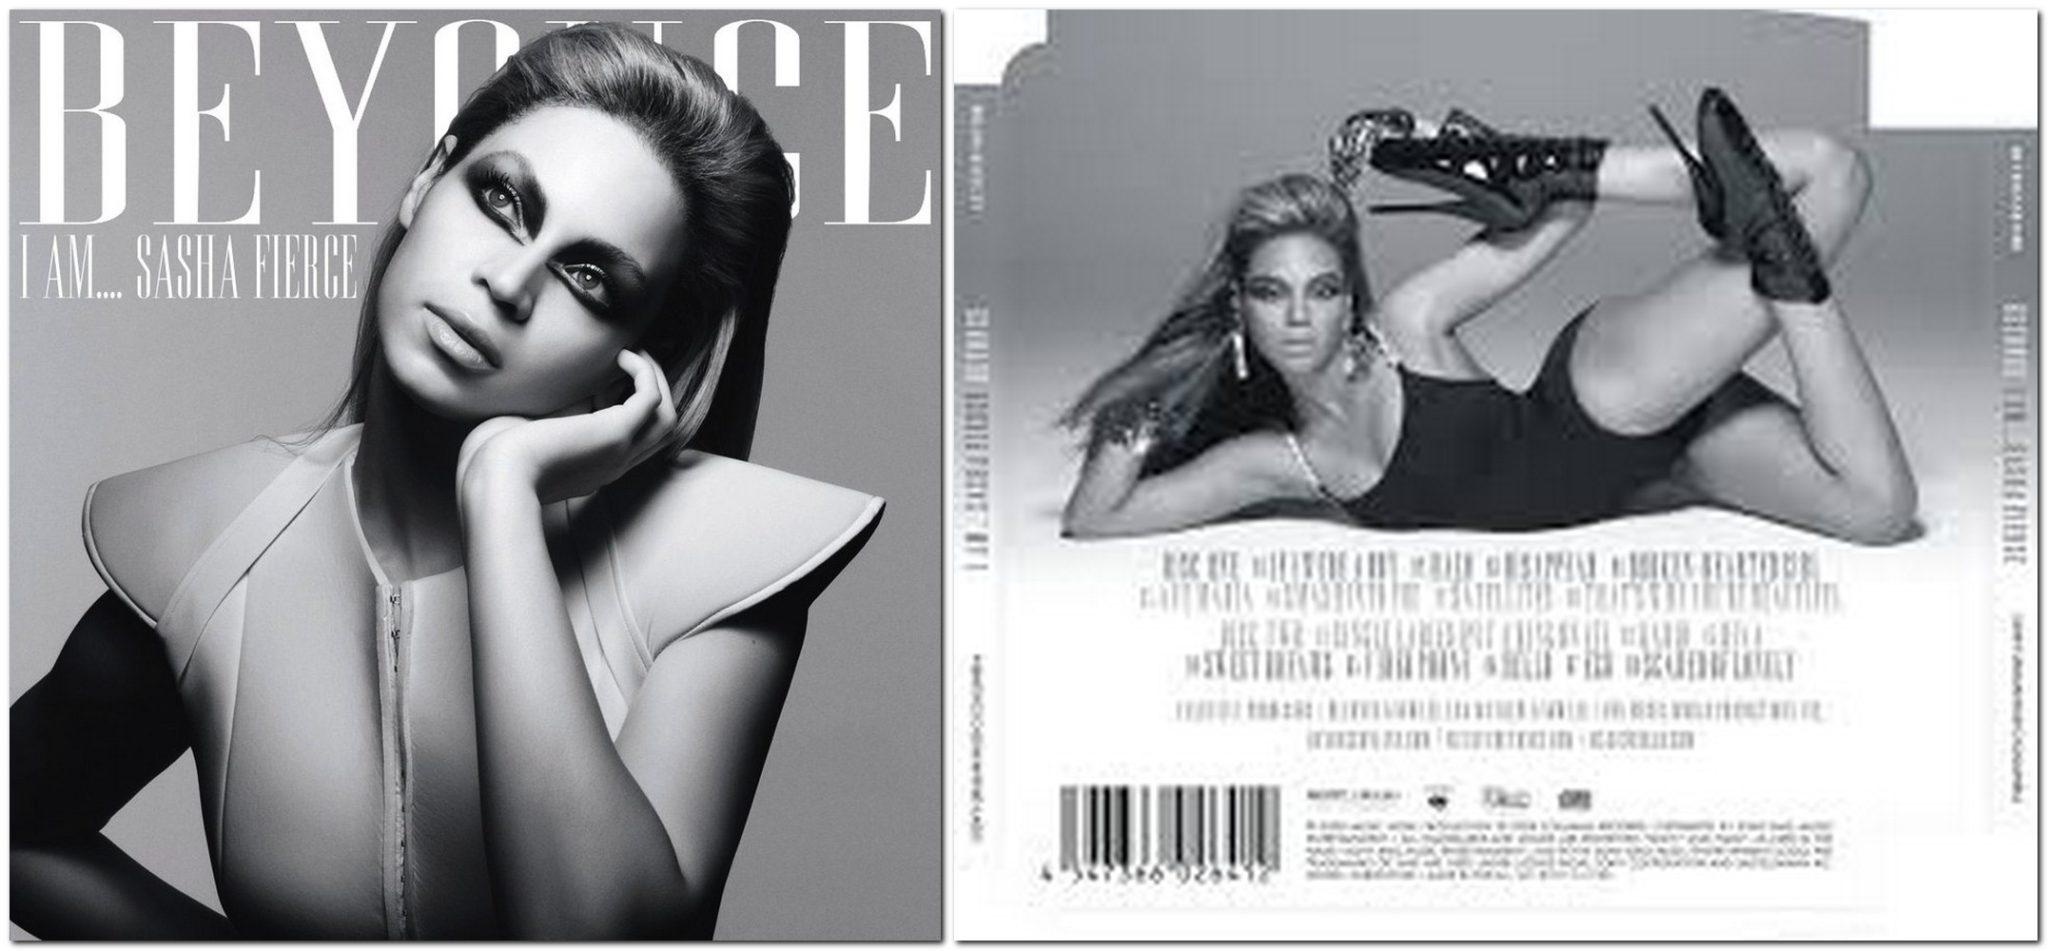 Beyonce. I Am... Sasha Fierce. Album Cover